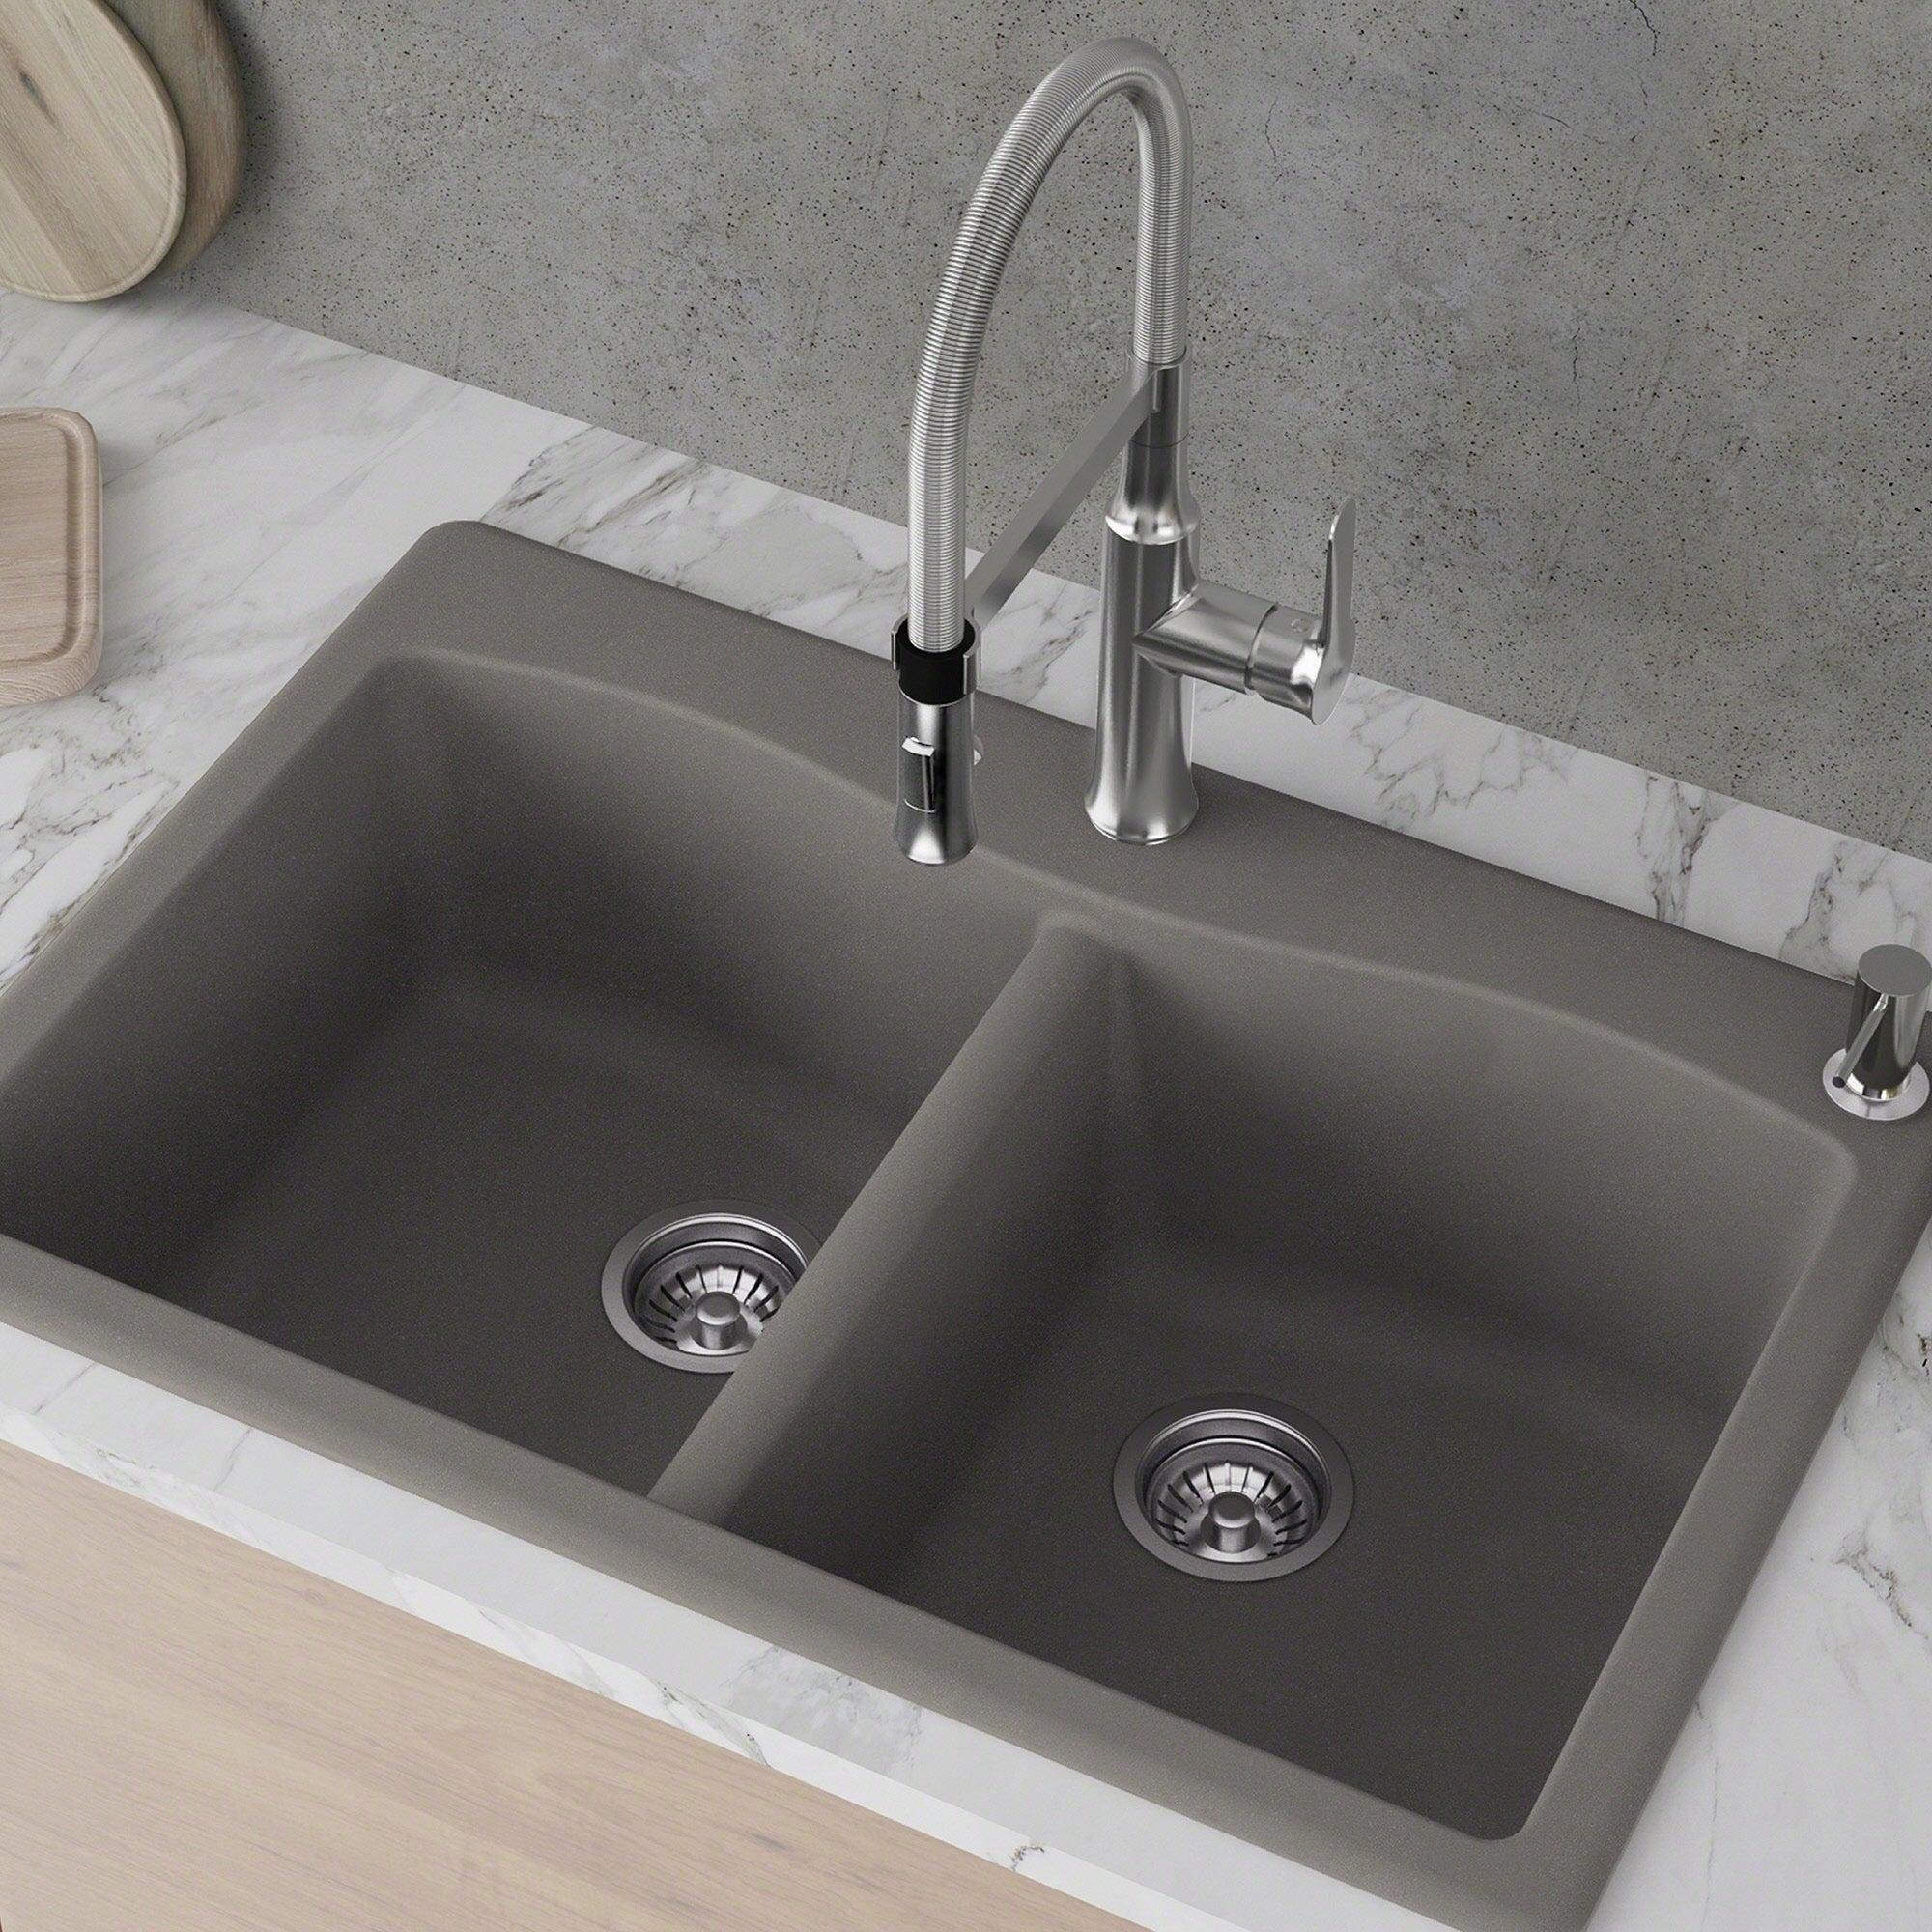 Drop In Kitchen Sink | Kraus Kgd 52 Forteza 33 Inch Undermount Drop In Dual Mount 50 50